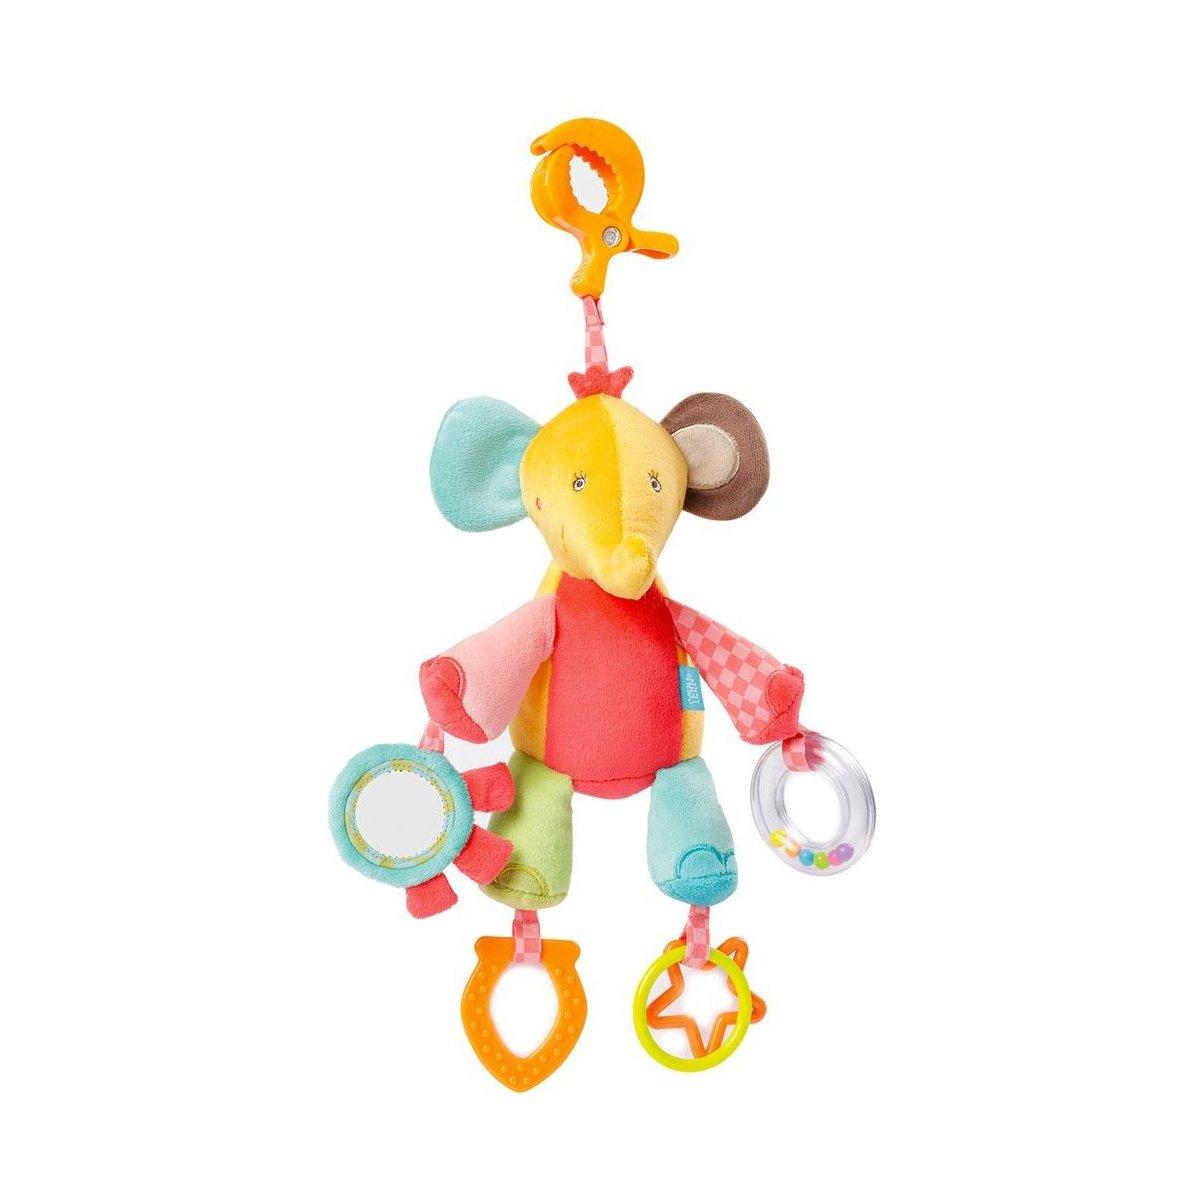 Jucarie bebelusi agatatoare Fehn, Elefantel